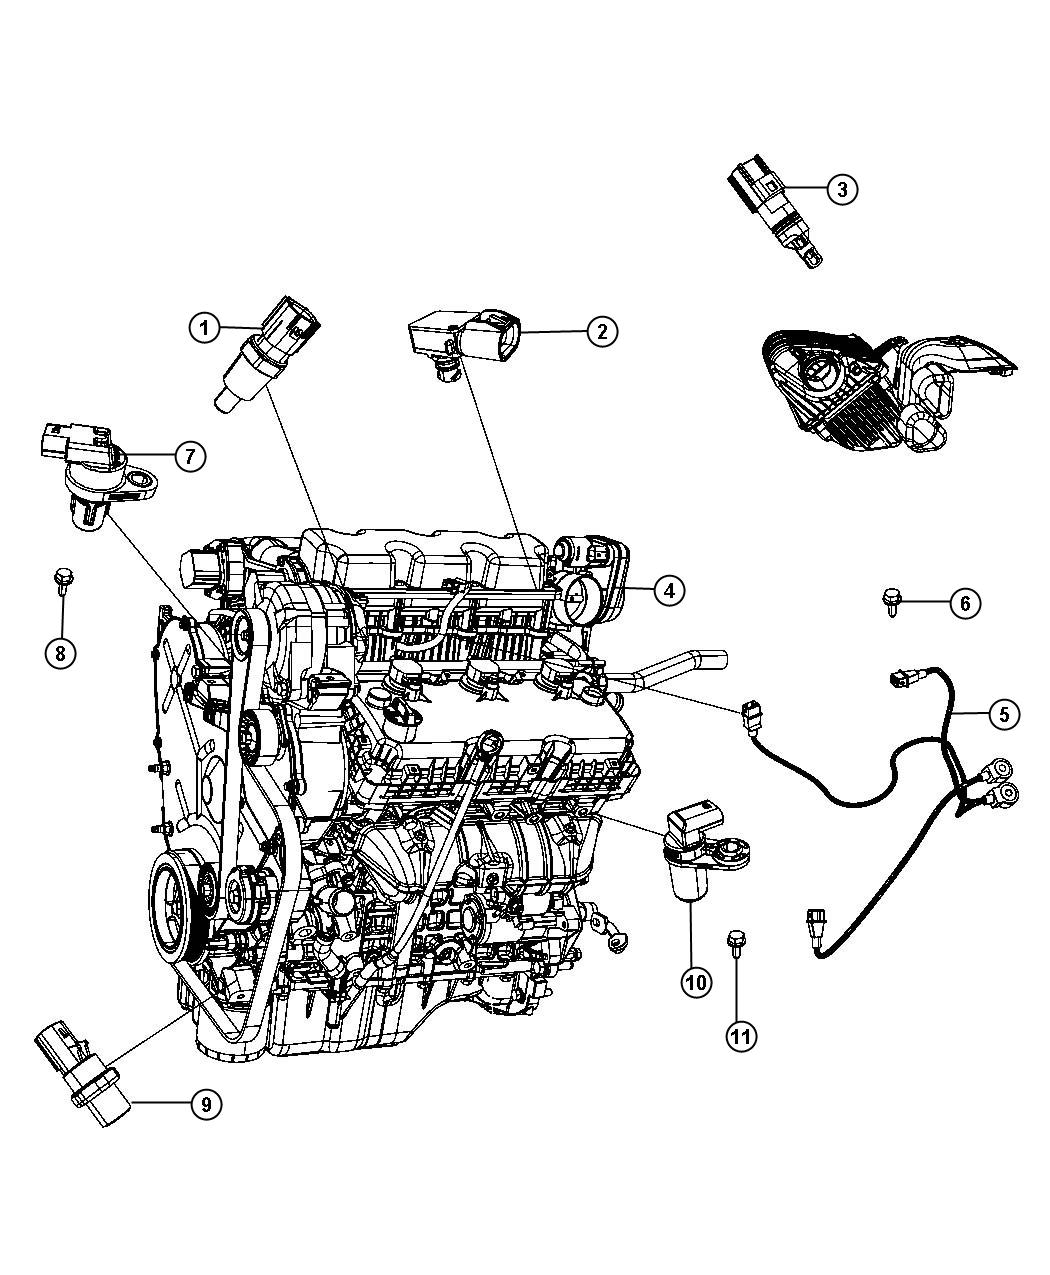 2010 Chrysler Sebring Sensor. Camshaft. [[electronic gas